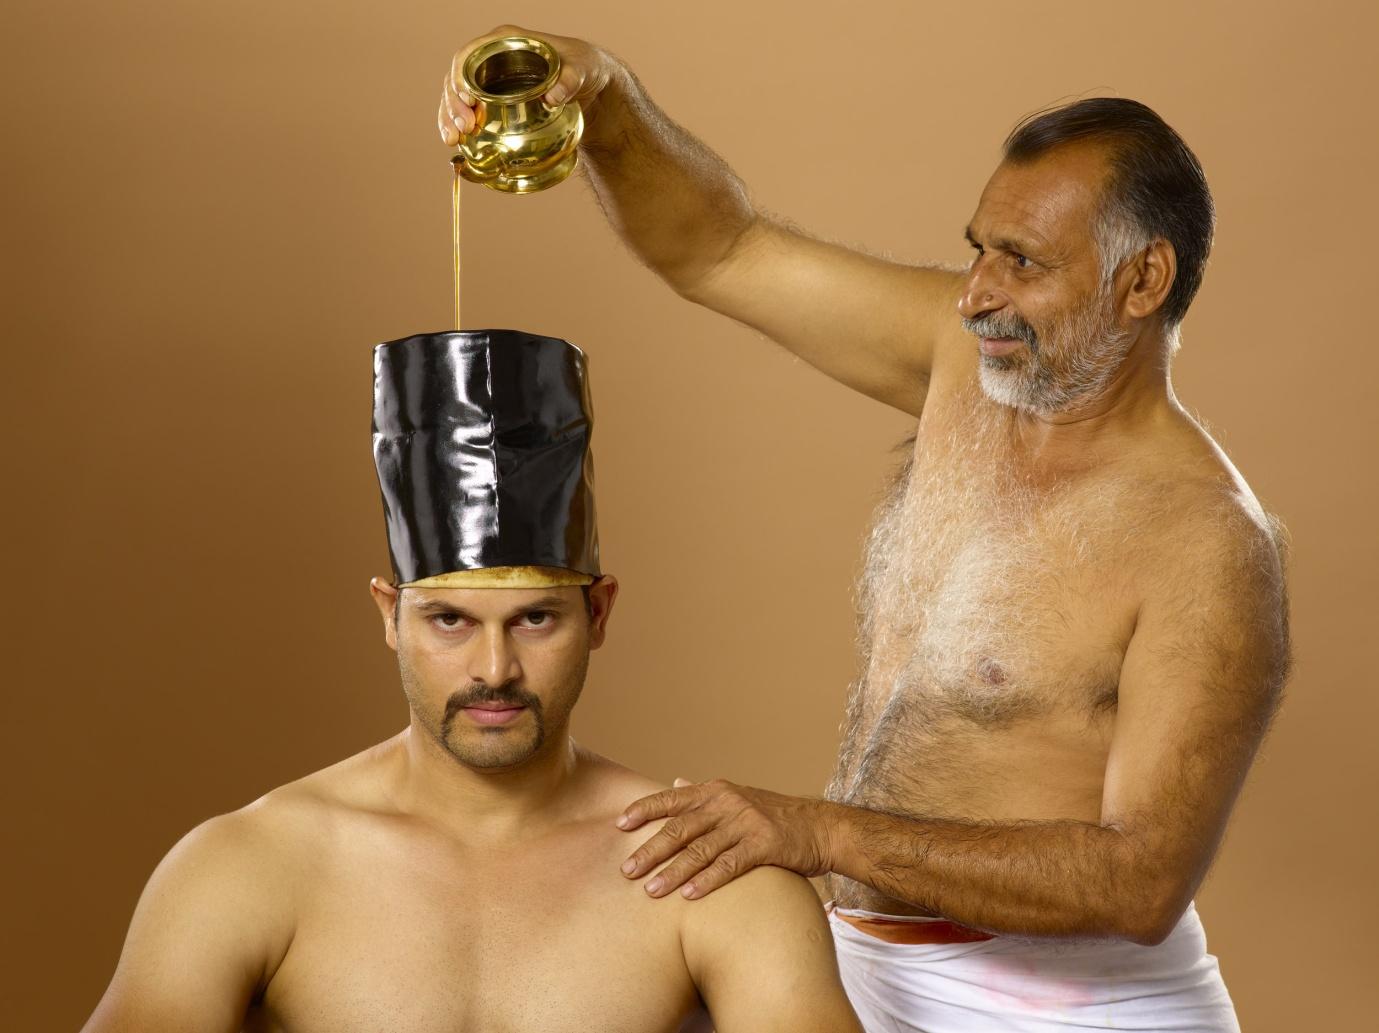 Shiro basti (oil on the head)